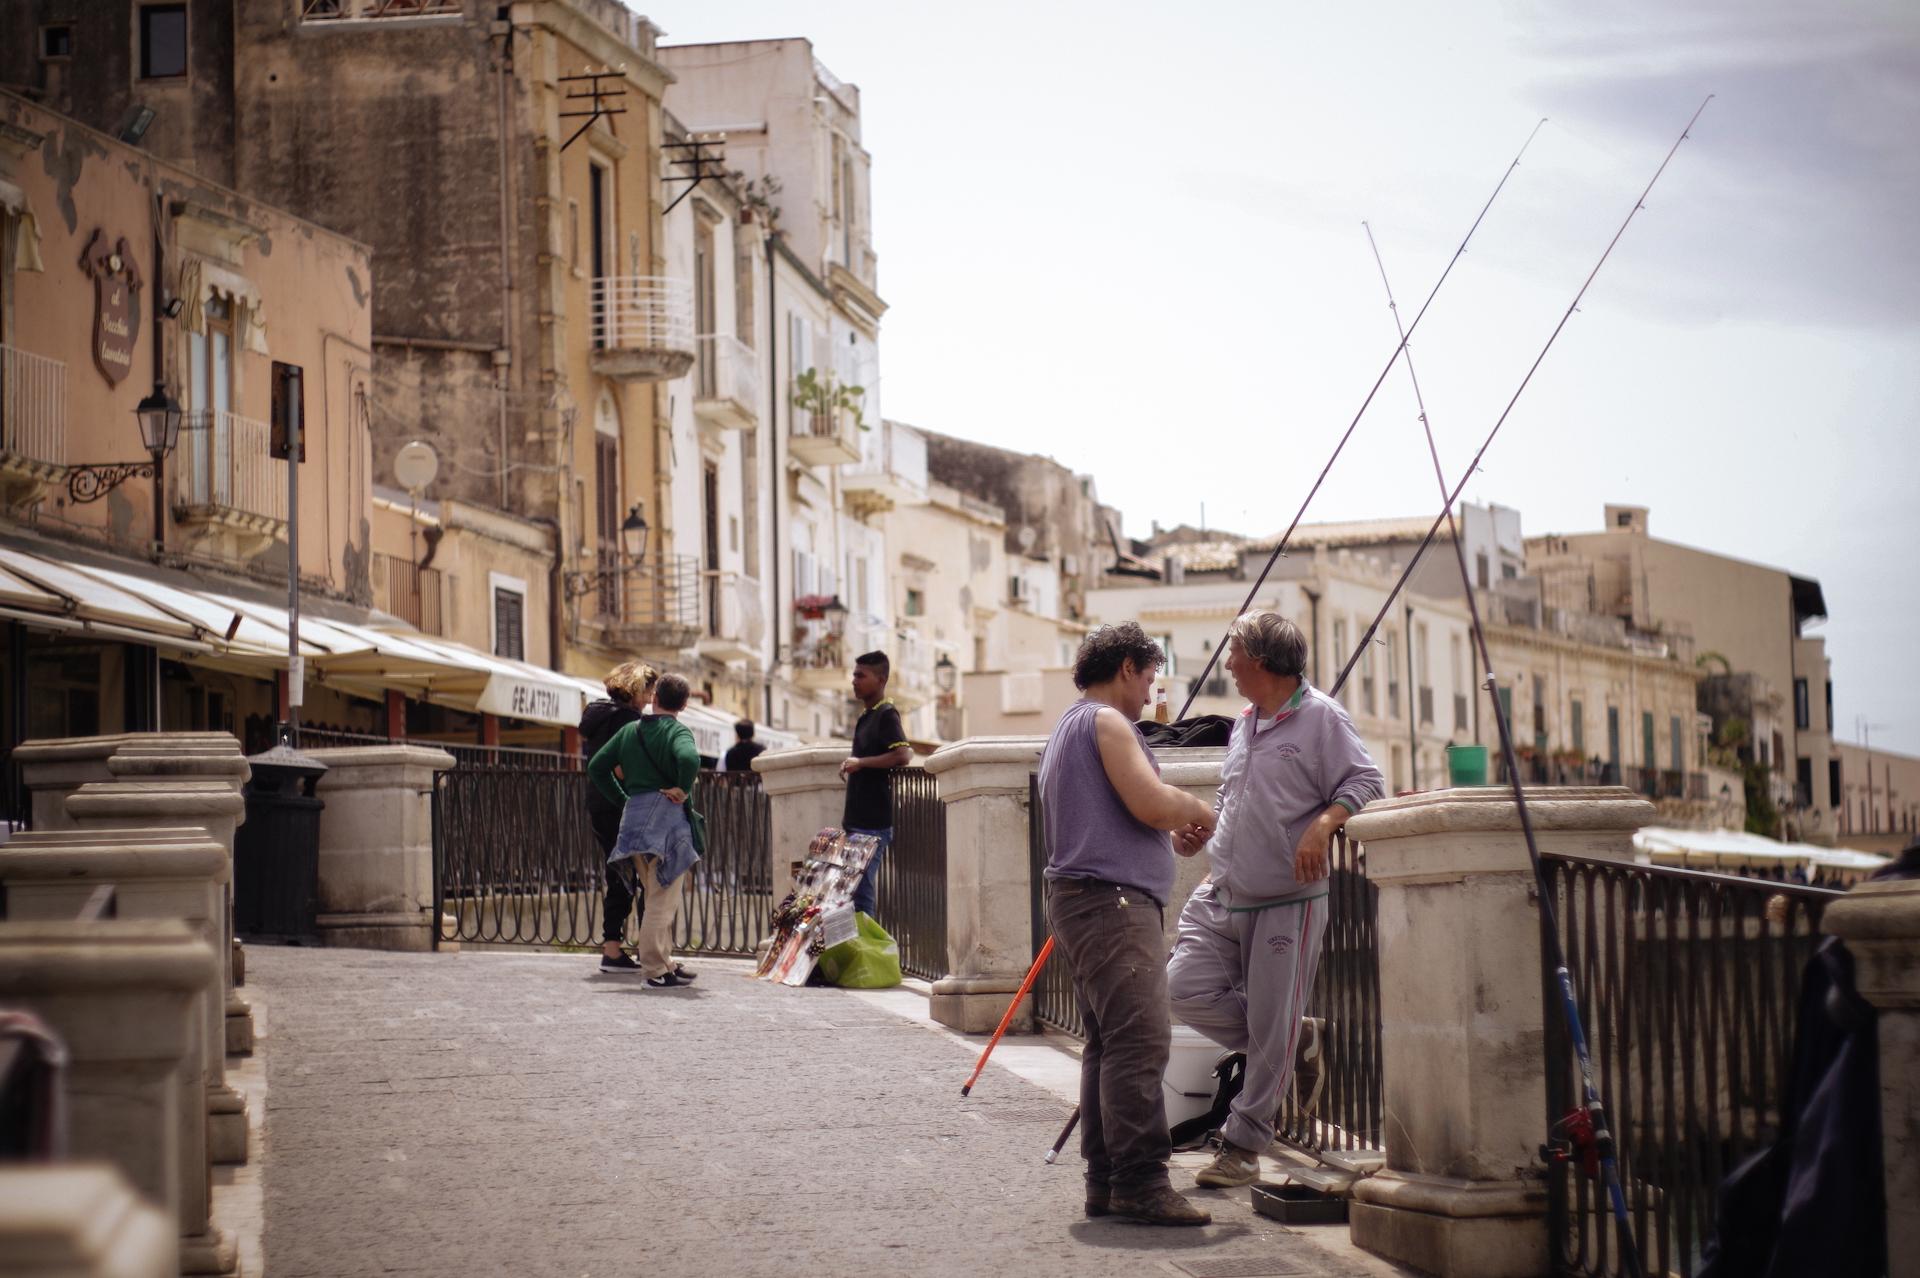 SICILY - Syracuse/Ortigia